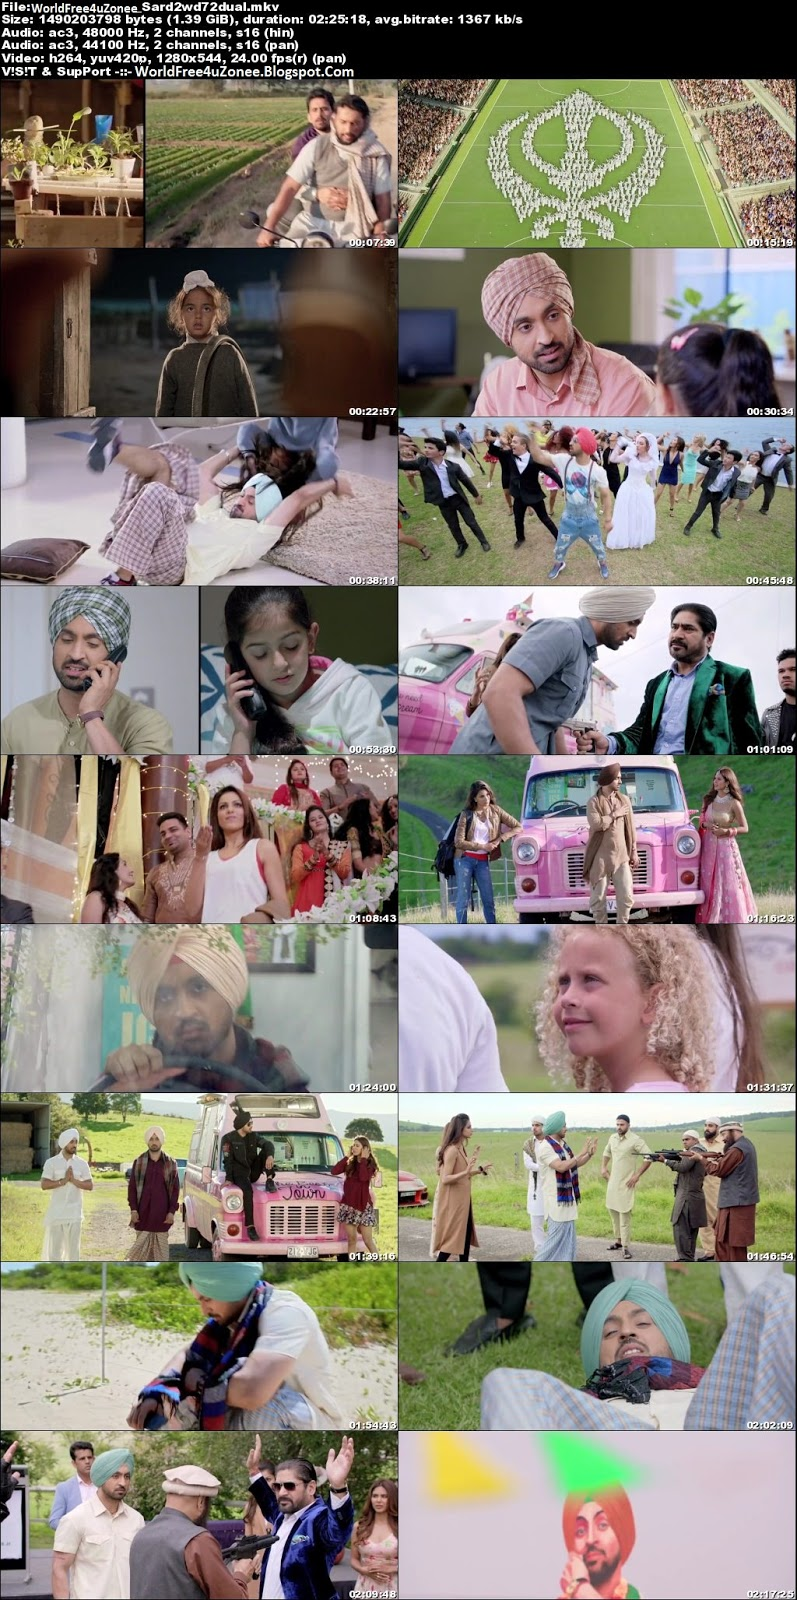 Sardaar Ji 2 (2016) Dual Audio HDRip 1.3GB 720p Full Movie Free Download And Watch Online Latest Punjabi Movies 2017/2018 Free At WorldFree4uZonee.Blogspot.Com